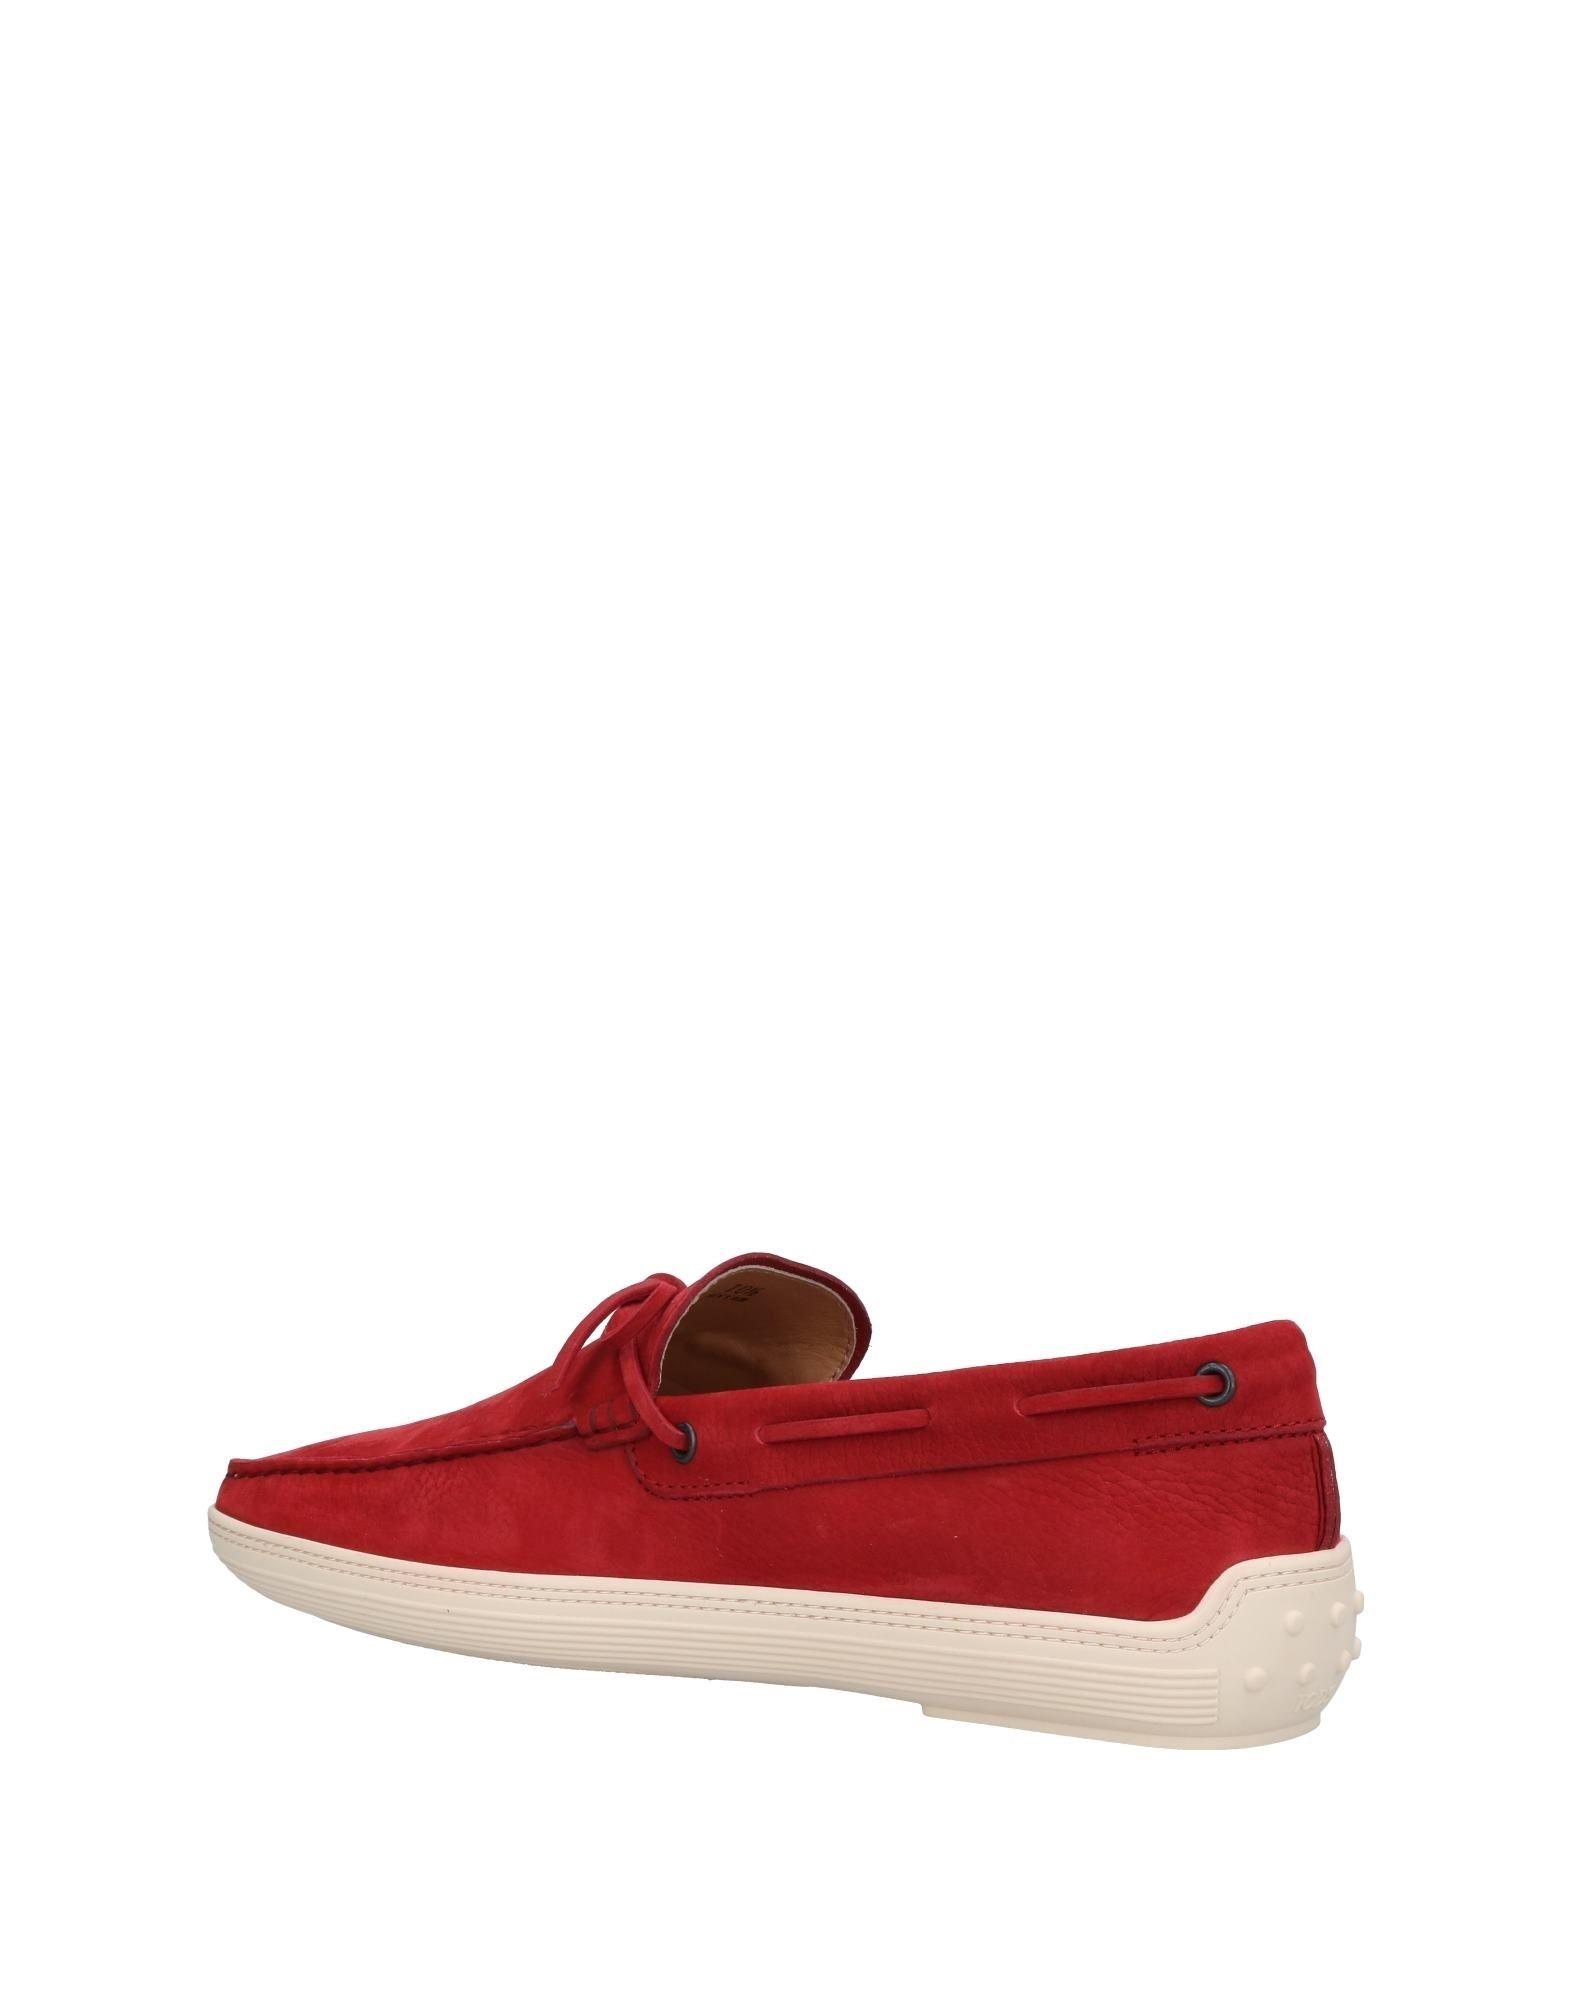 Tod's Tod's Tod's Mokassins Herren  11135119LS Gute Qualität beliebte Schuhe 7db7c9